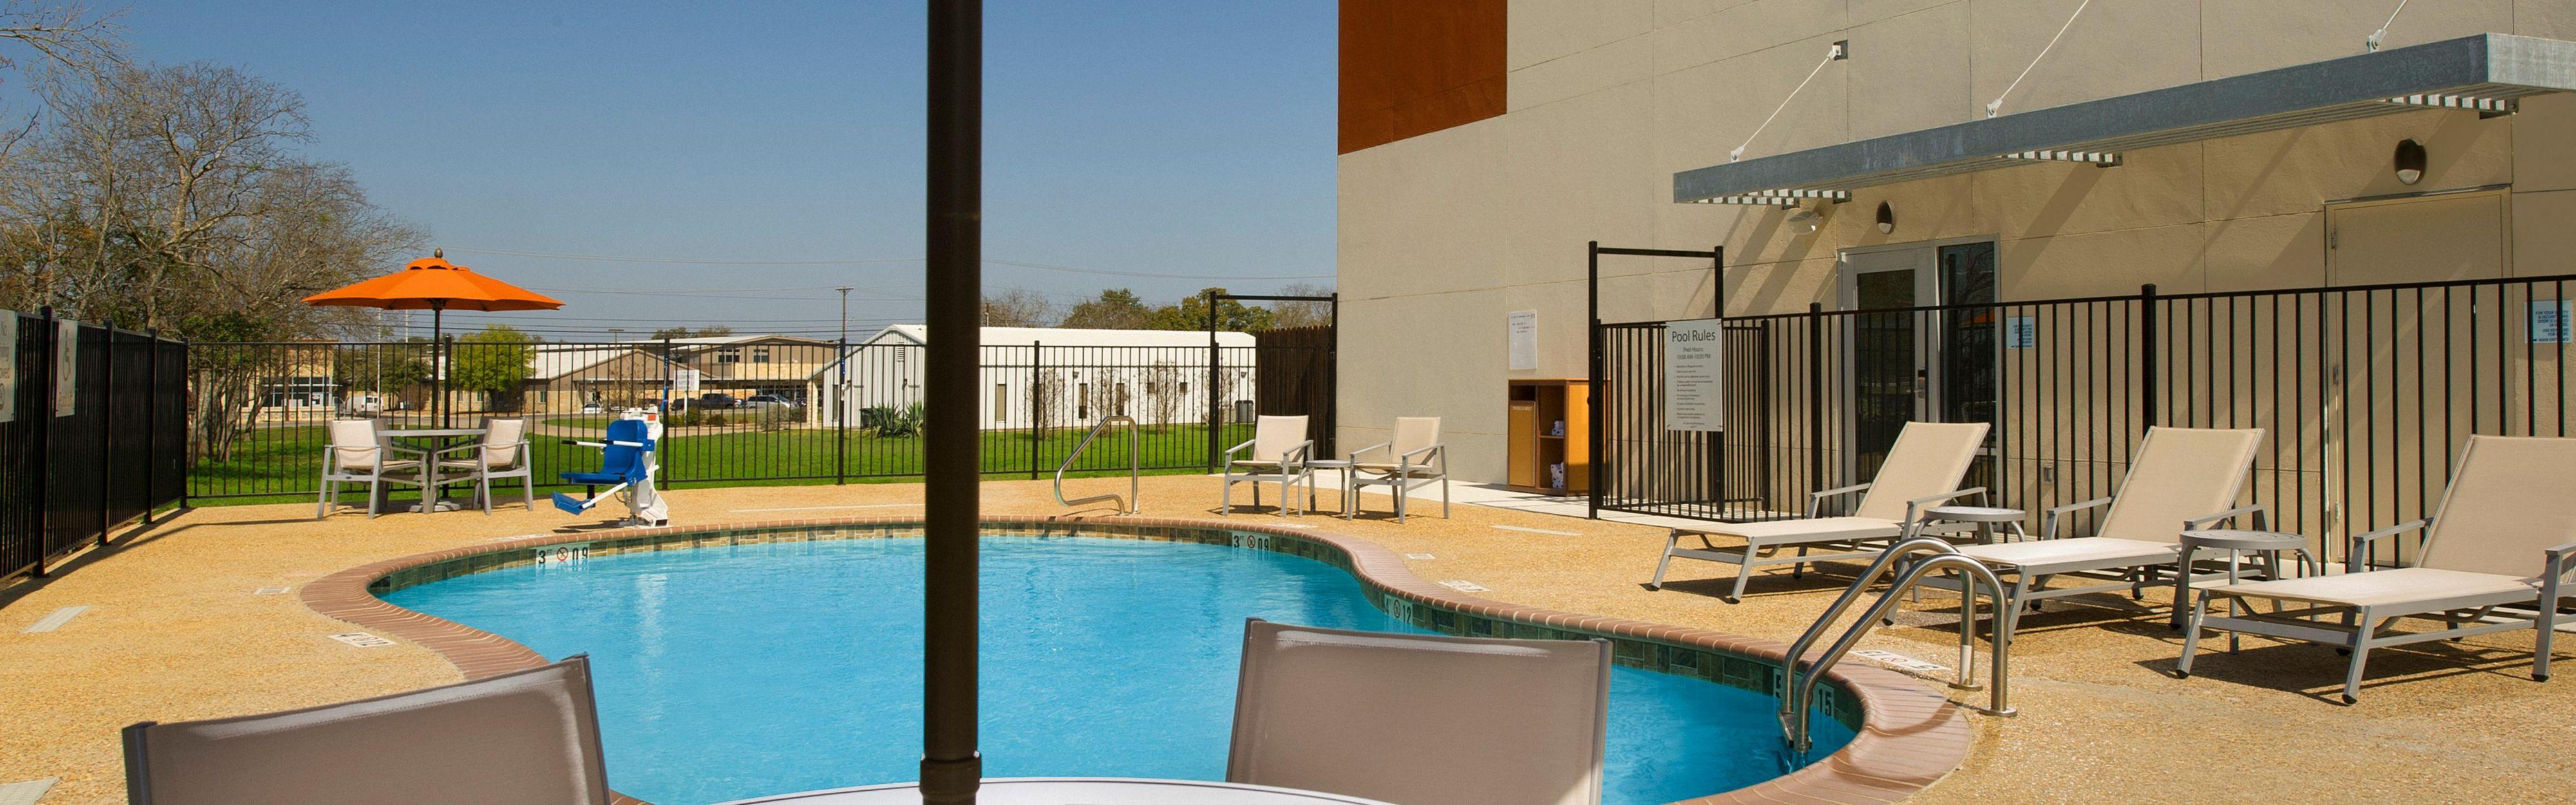 Holiday Inn Express Suites New Braunfels New Braunfels Texas Tx